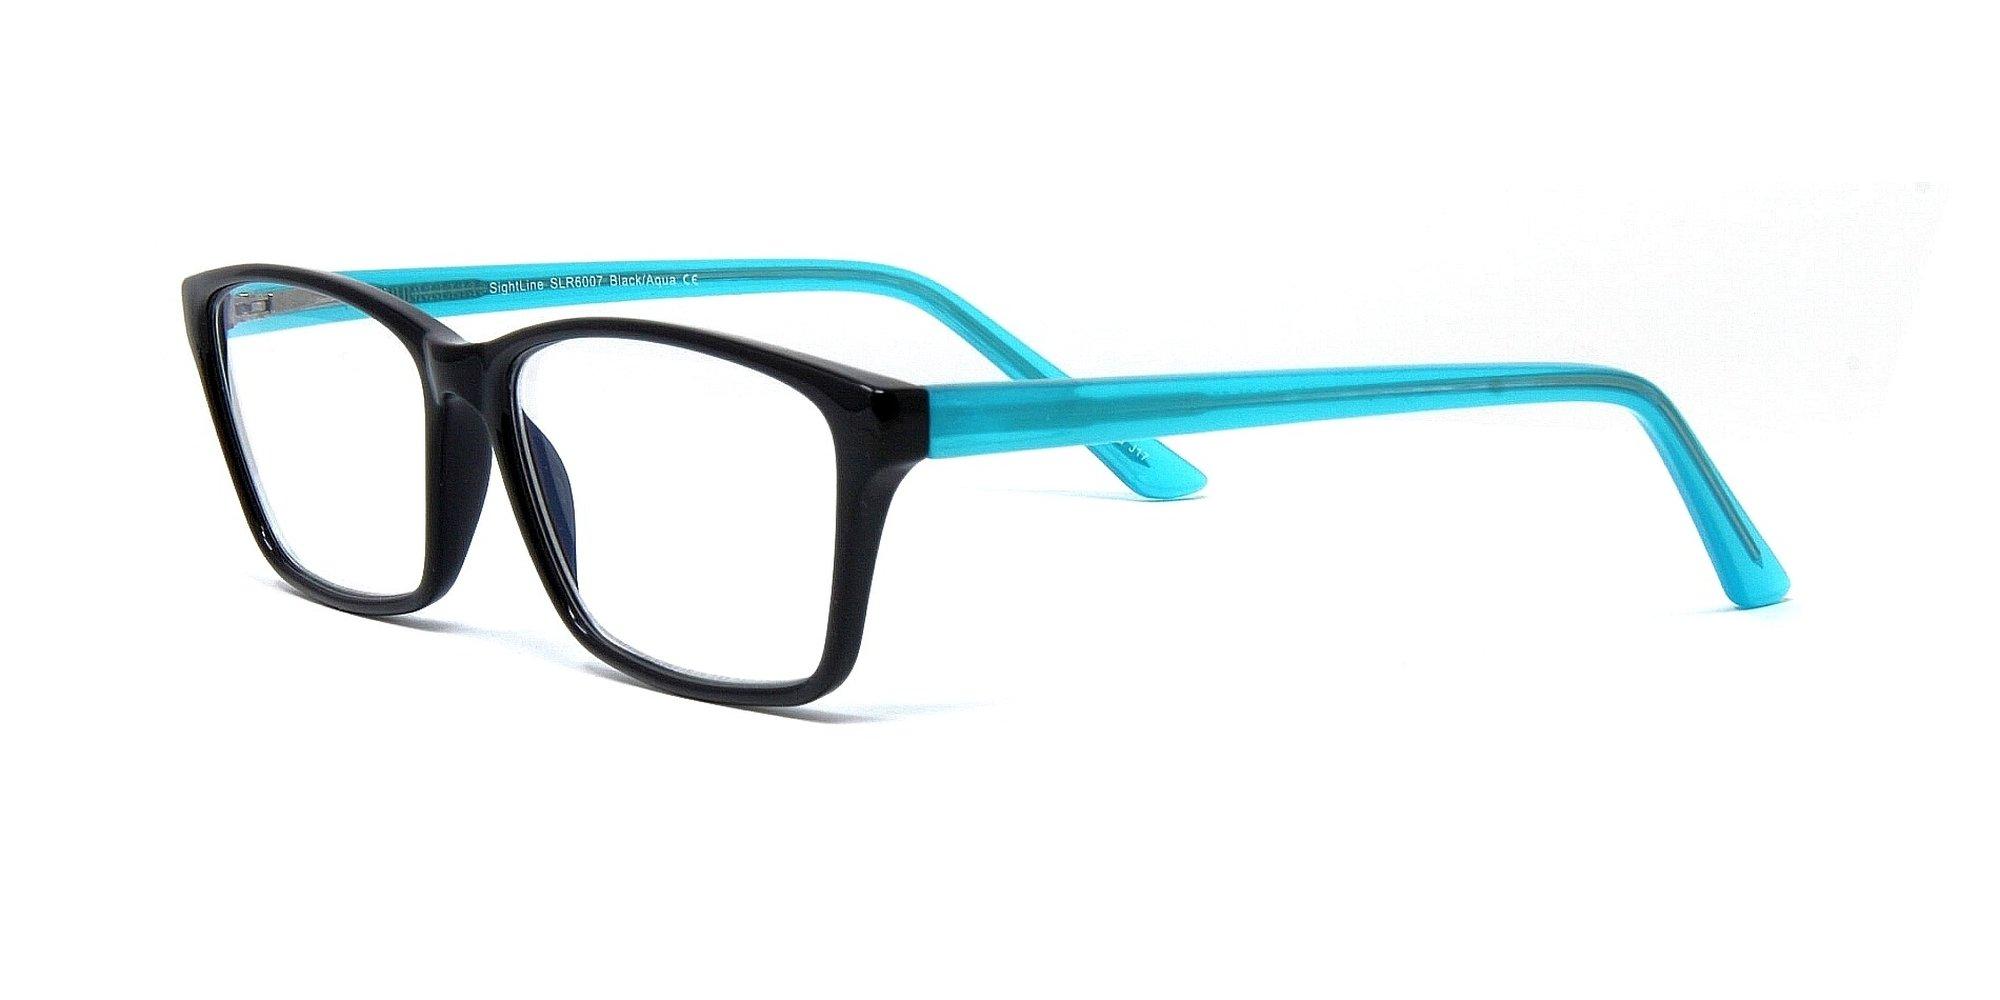 SightLine 6007 Multifocal Reading Glasses +2.50 Progressive Magnification Lenses With Anti-Glare Coating; Frame Size: 54-15/140